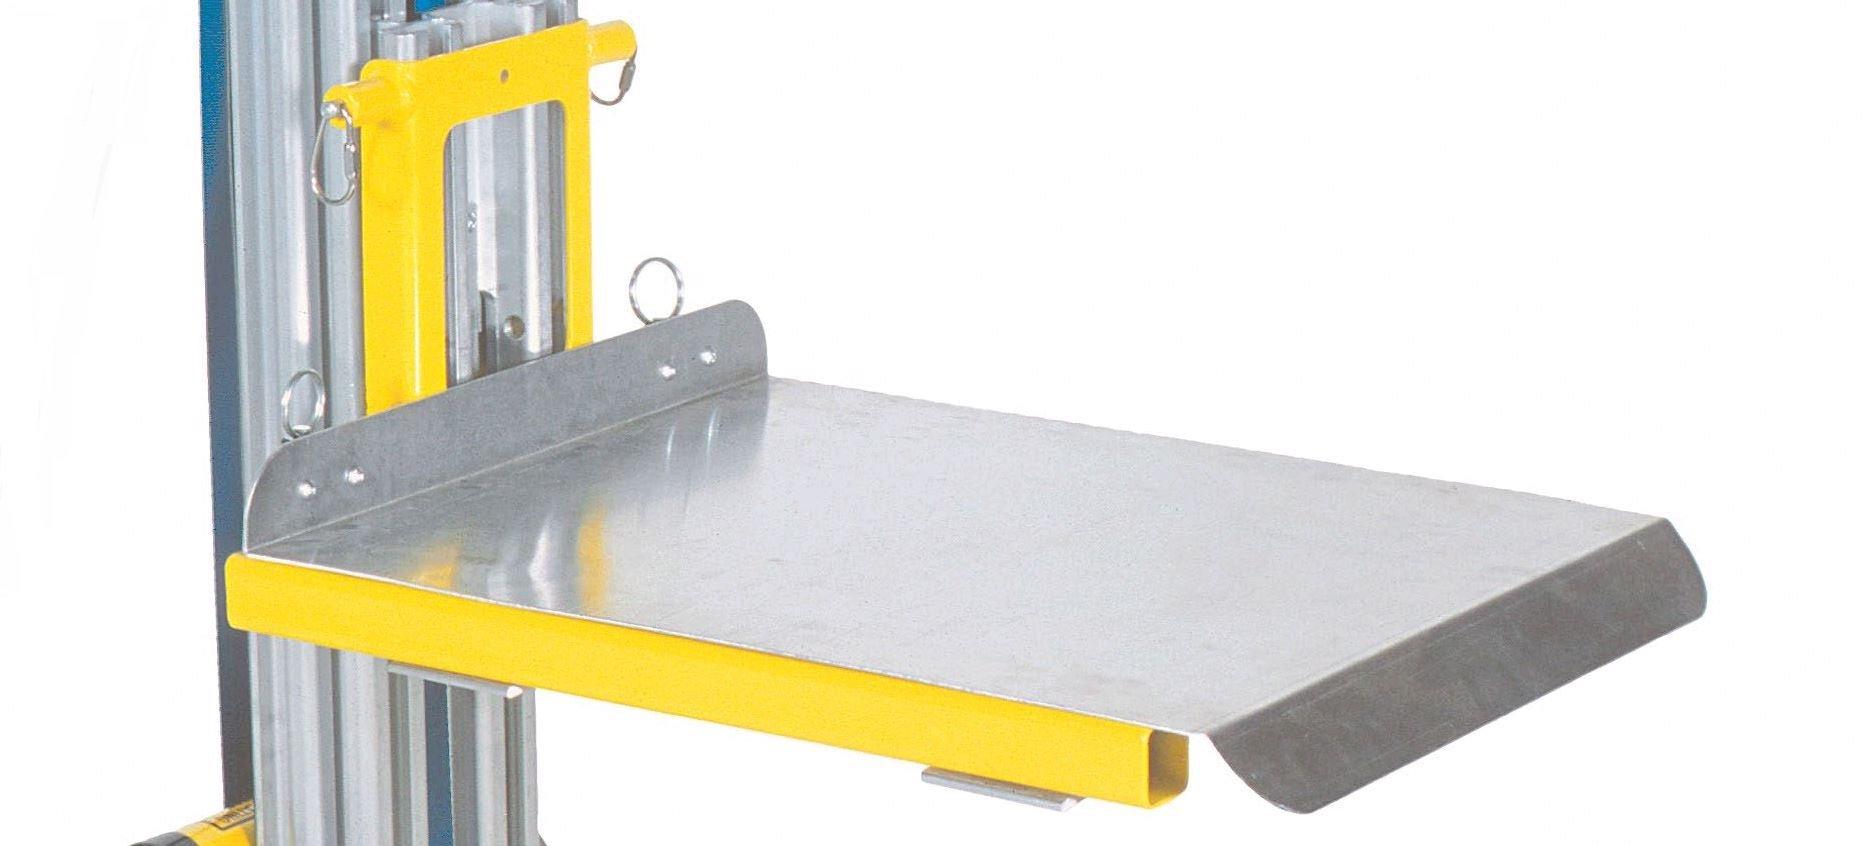 Sumner 784240 Aluminum Tray for Series 2200 Lil' Hoister